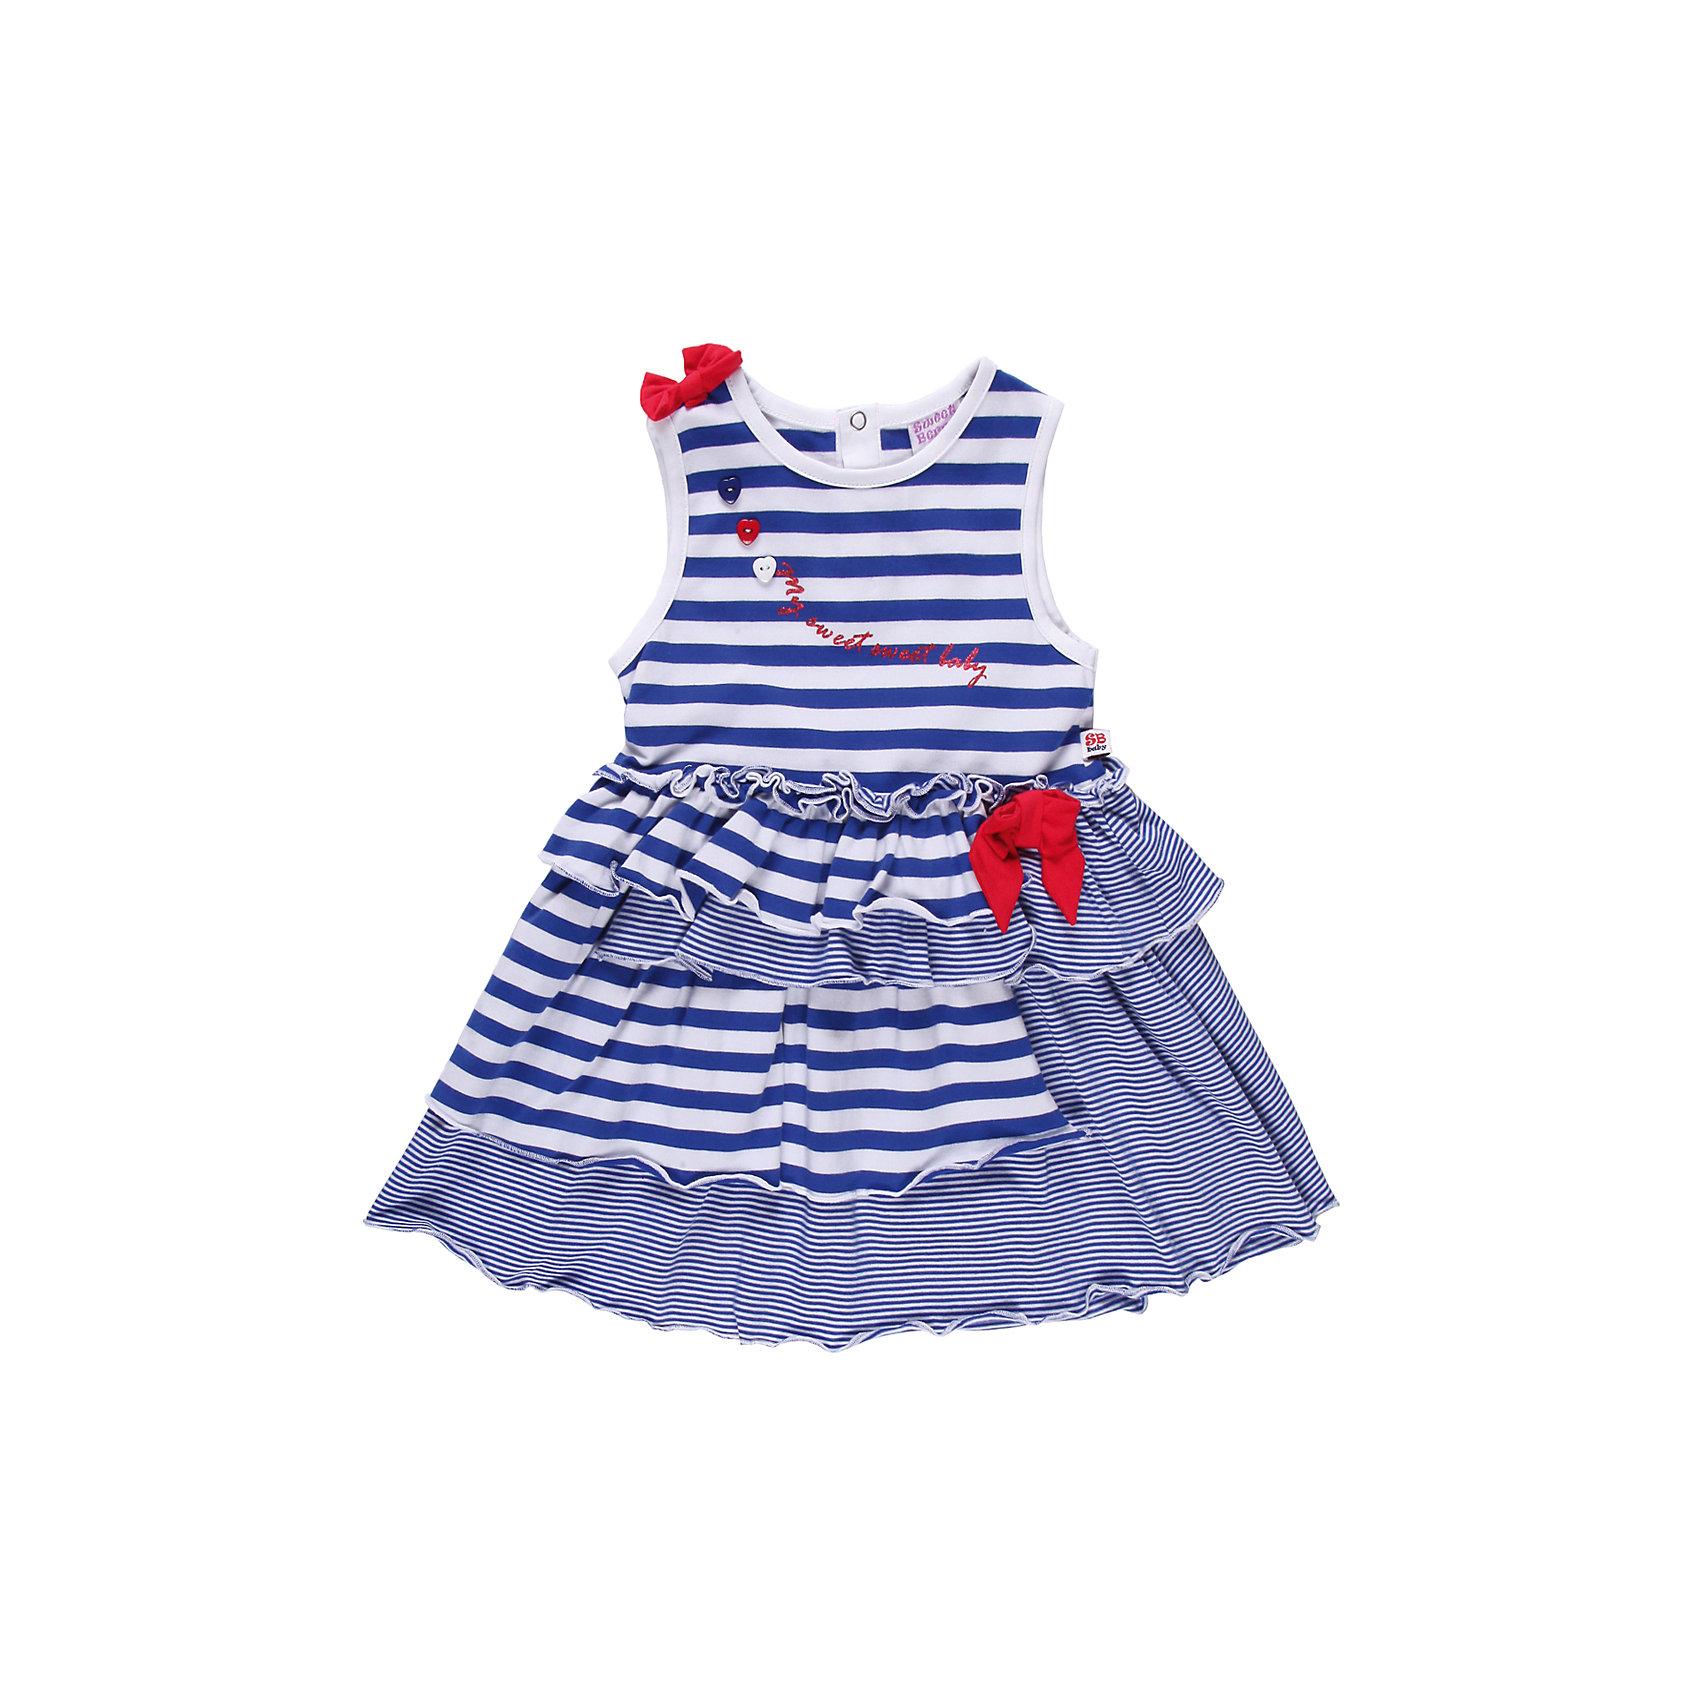 Платье для девочки Sweet BerryПлатья<br>Романтичное платье  из тонкого трикотажа. Два вида полосок. Декорировано яркими бантами.<br>Состав:<br>95% хлопок, 5% эластан<br><br>Ширина мм: 236<br>Глубина мм: 16<br>Высота мм: 184<br>Вес г: 177<br>Цвет: белый/синий<br>Возраст от месяцев: 9<br>Возраст до месяцев: 12<br>Пол: Женский<br>Возраст: Детский<br>Размер: 80,92,98,86<br>SKU: 4520368